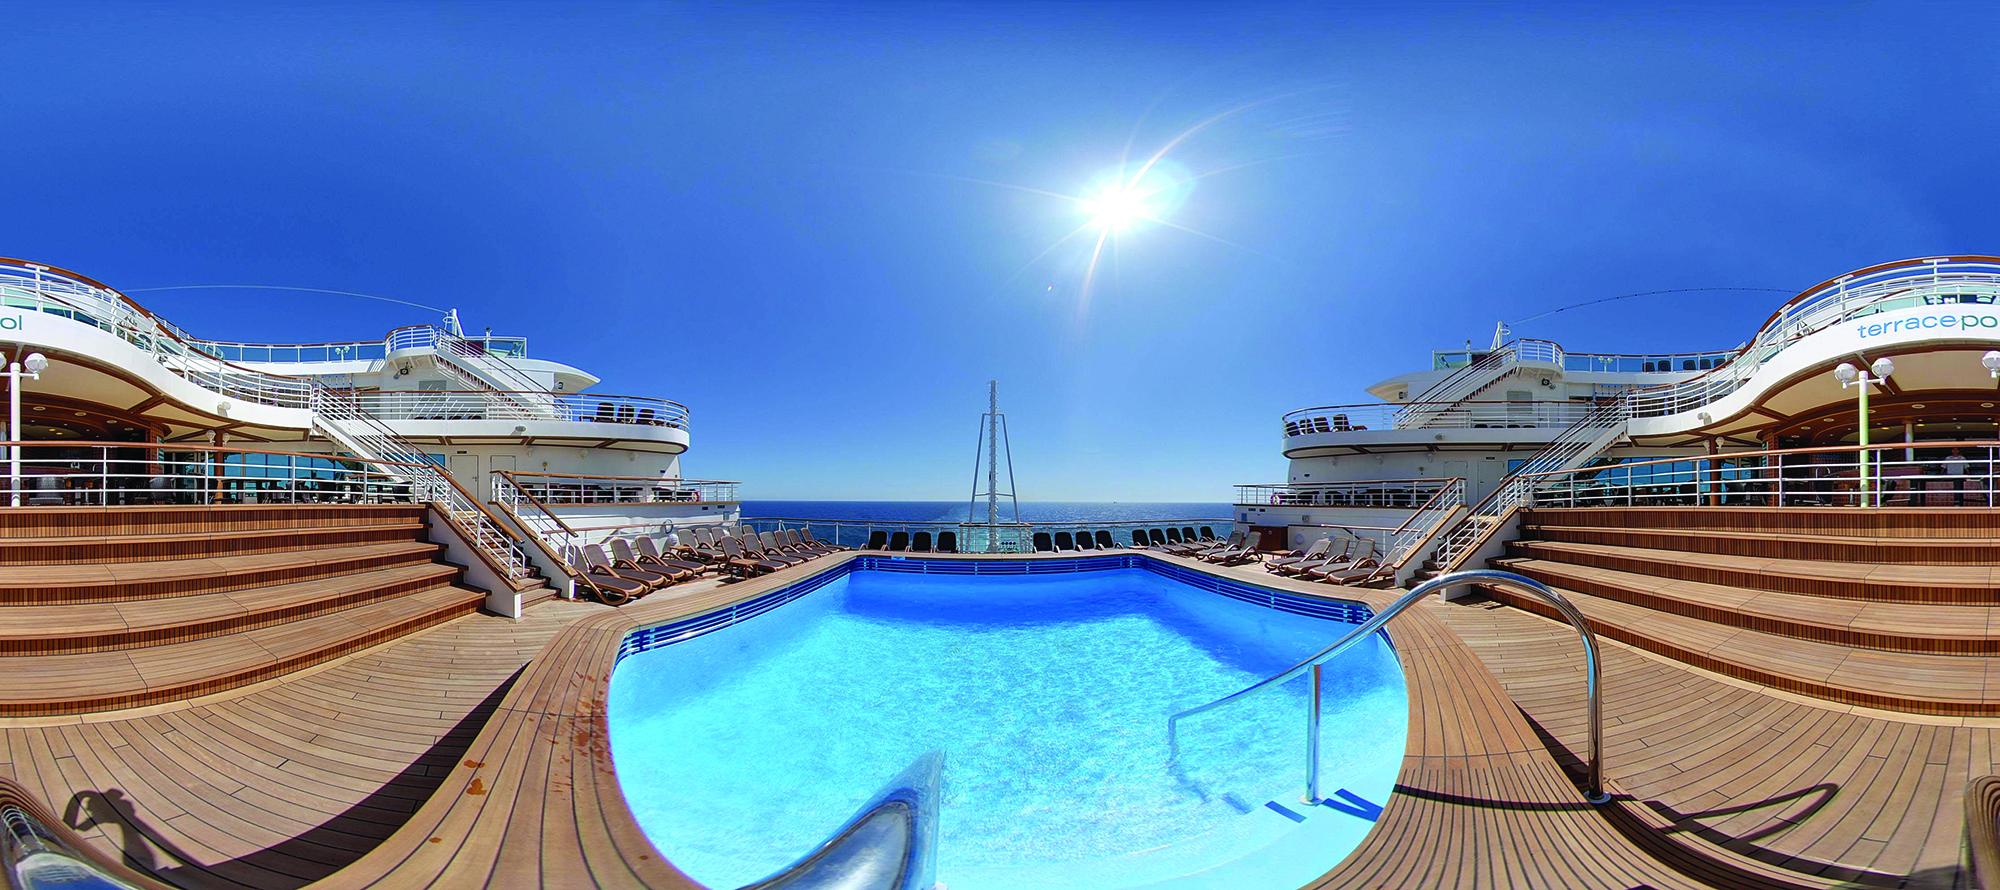 azura terrace pool.jpg